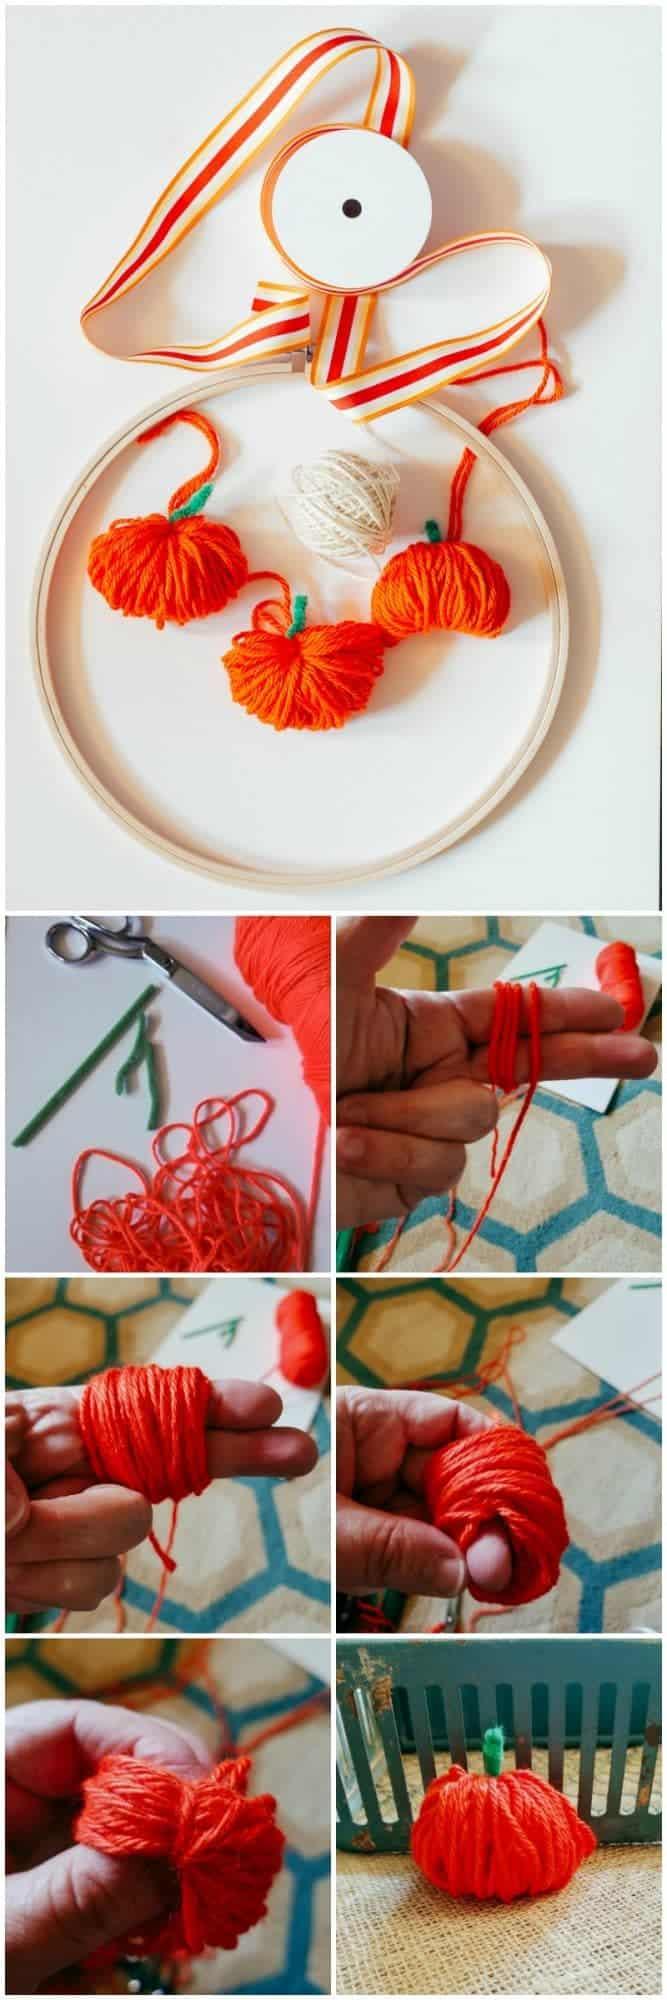 How to make a chubby yarn pumpkin